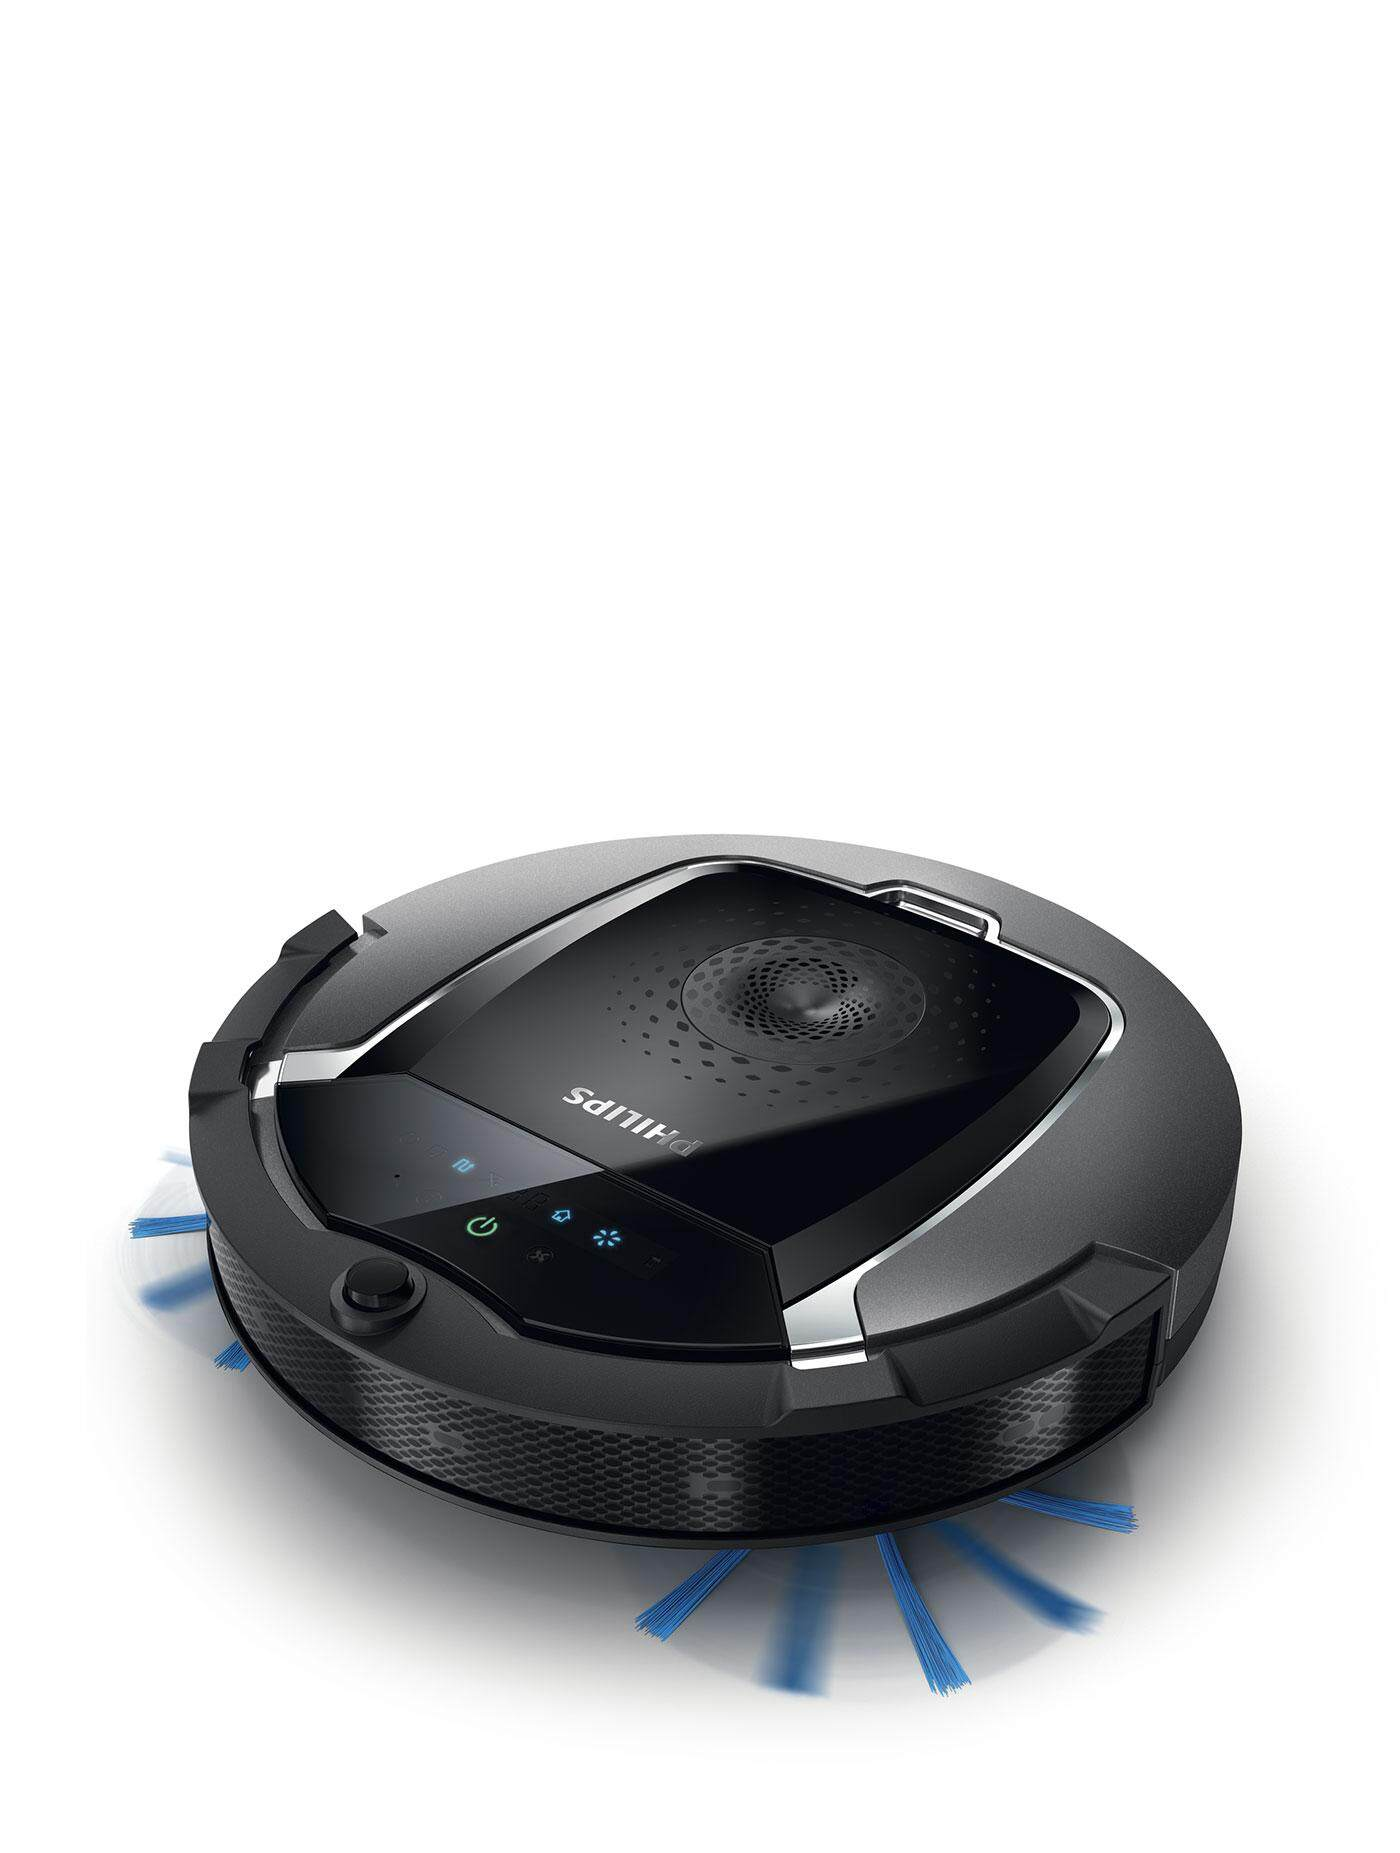 PHILIPS หุ่นยนต์ดูดฝุ่น รุ่น FC8822